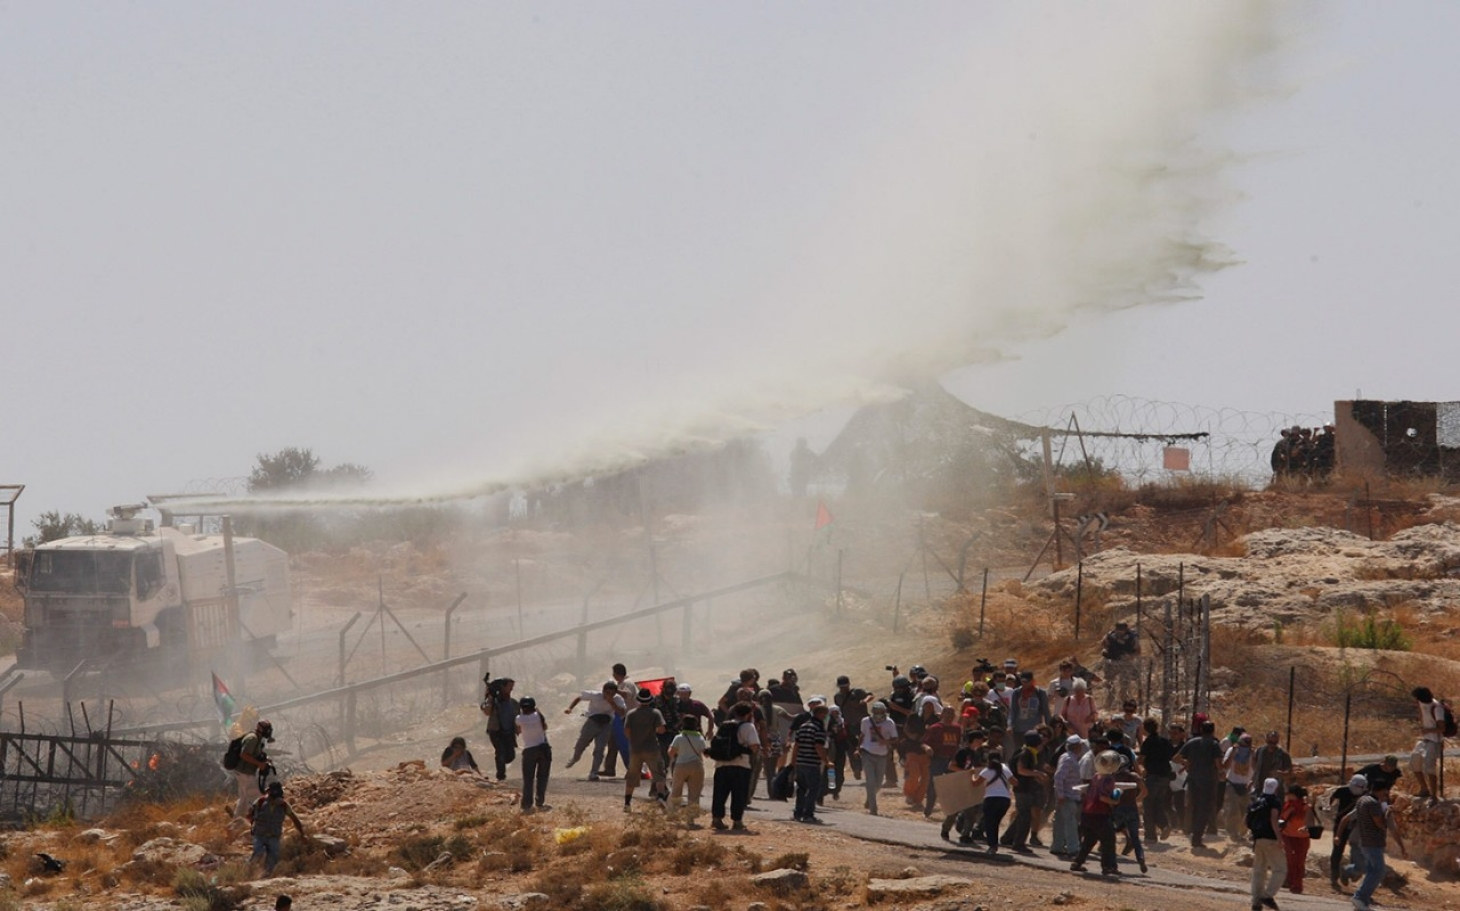 https://i2.wp.com/america.aljazeera.com/content/ajam/articles/2015/10/9/israel-uses-skunk-on-palestinians-but-what-is-it/jcr:content/headlineImage.adapt.1460.high.skunk_israel_palestine_100815.1444425547082.jpg